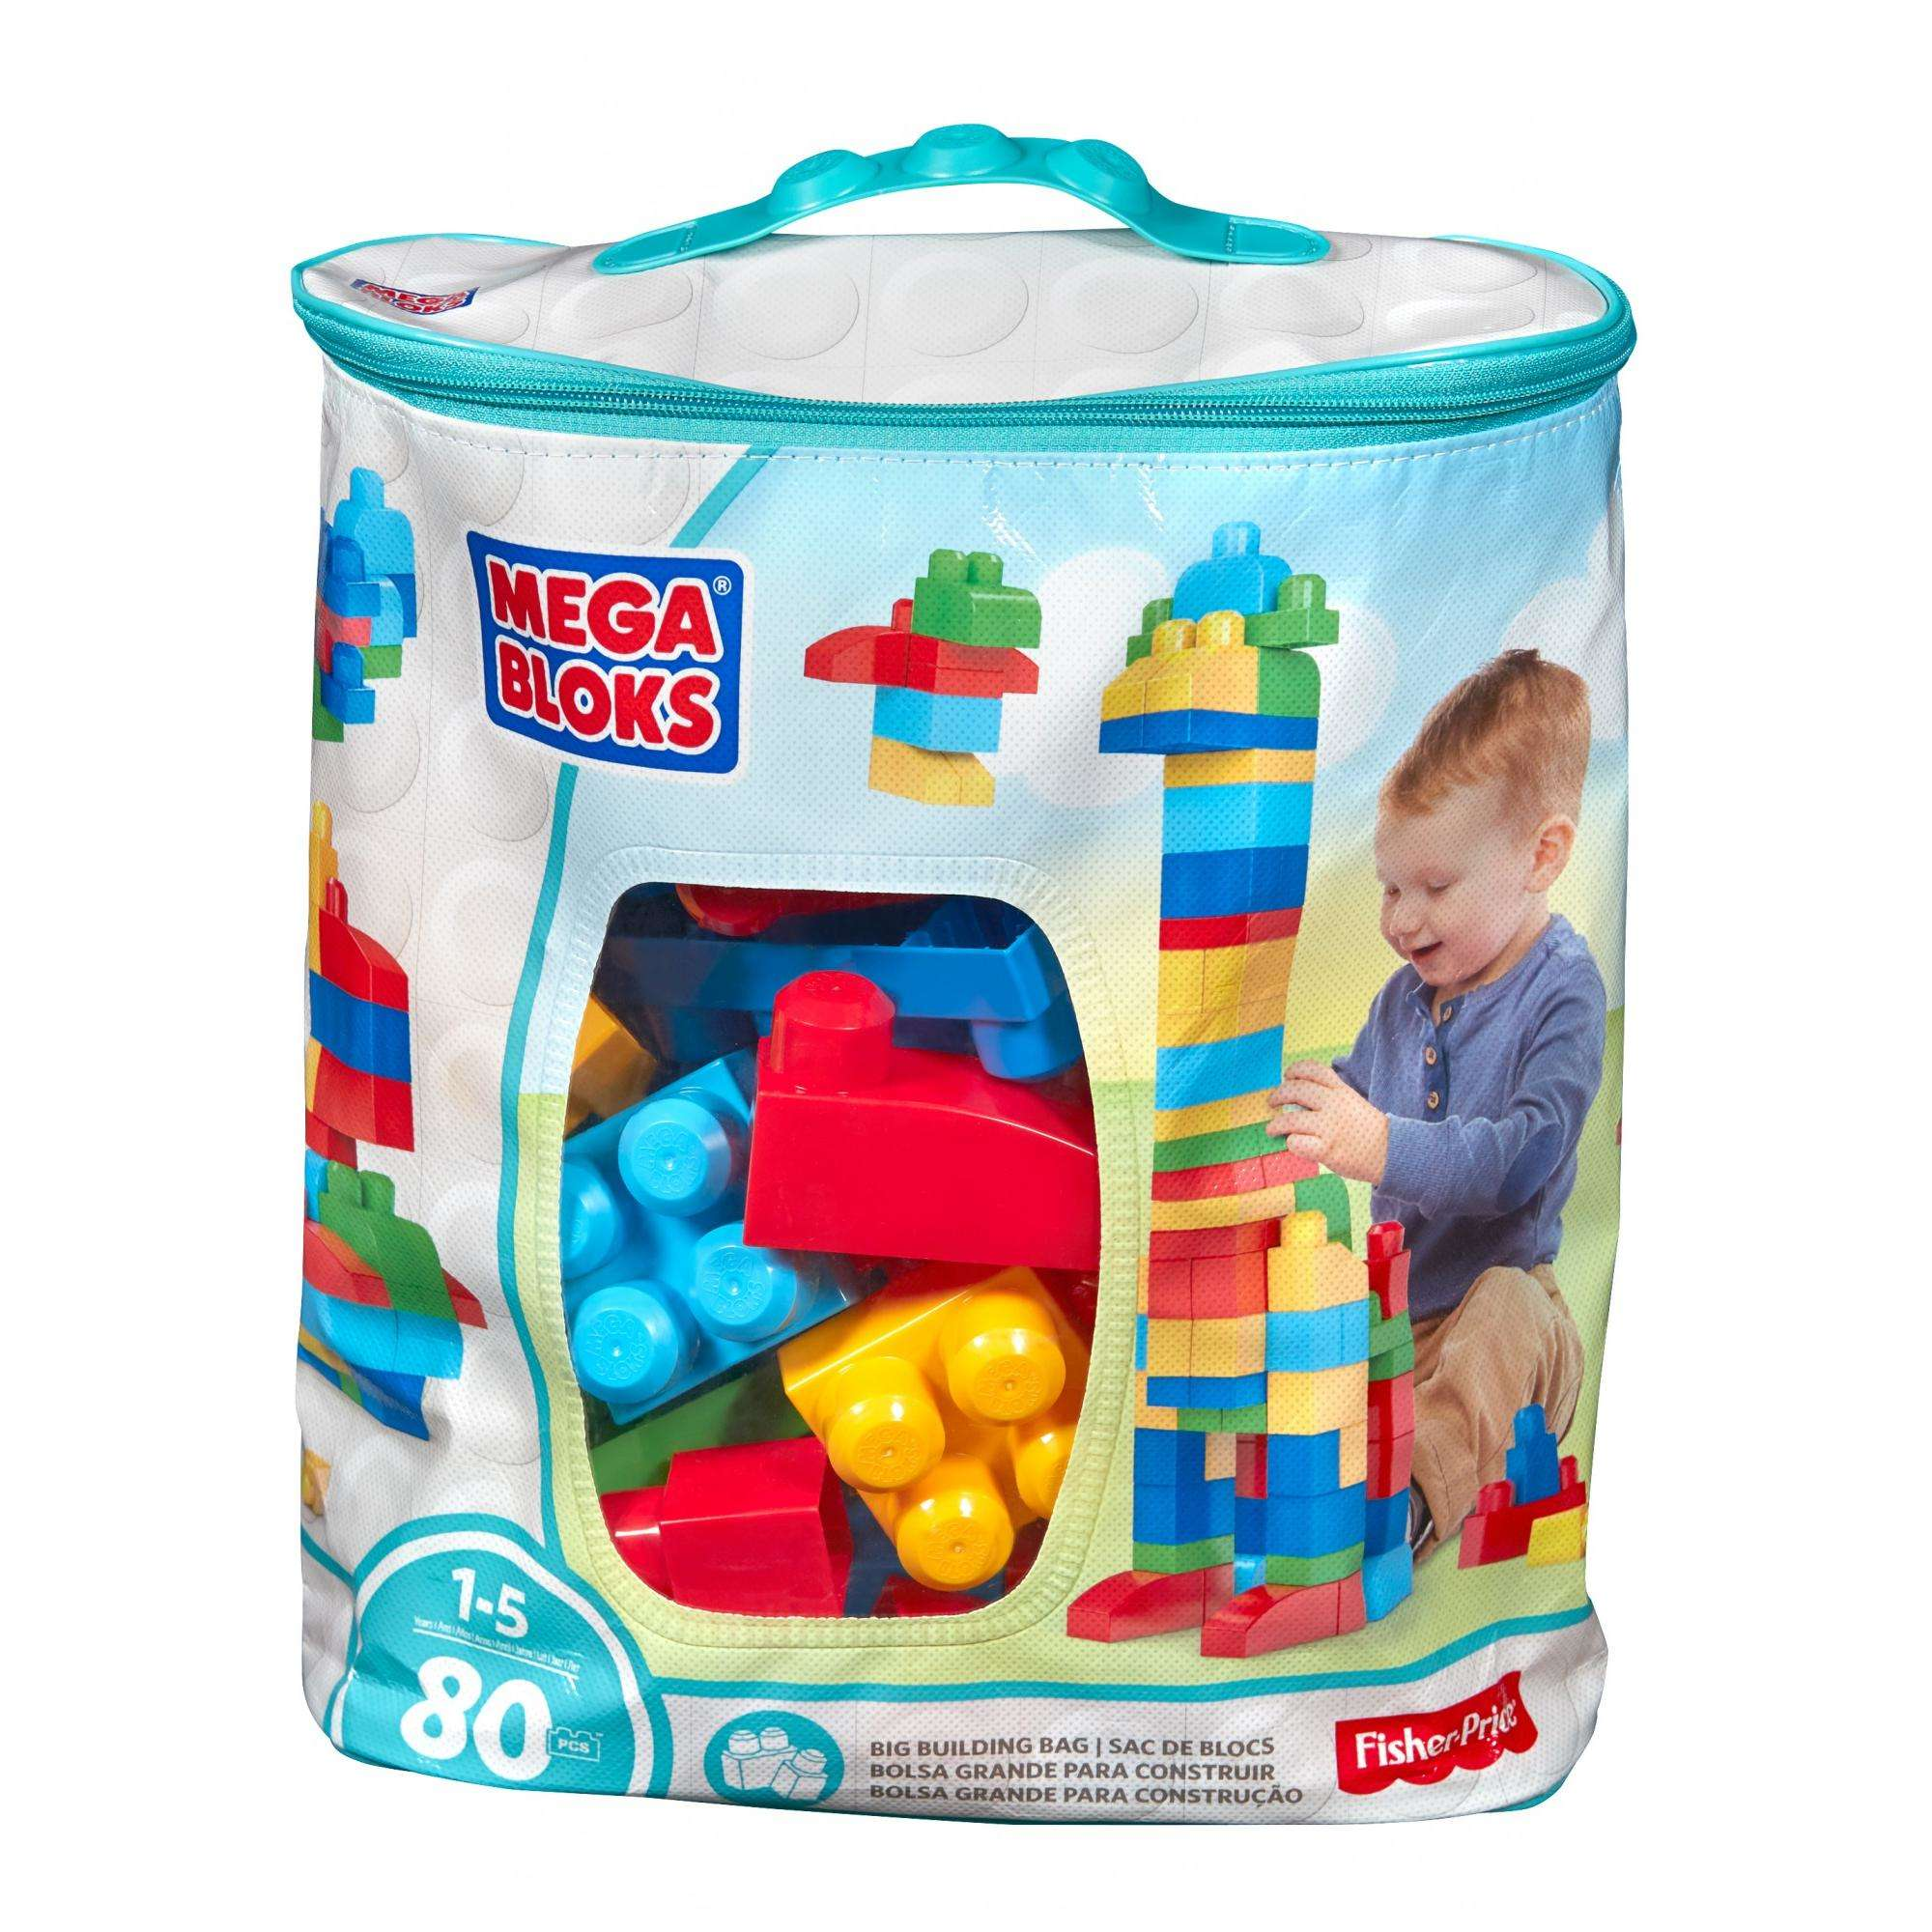 Mega Bloks First Builders Classic Big Building Bag 80-Piece Set